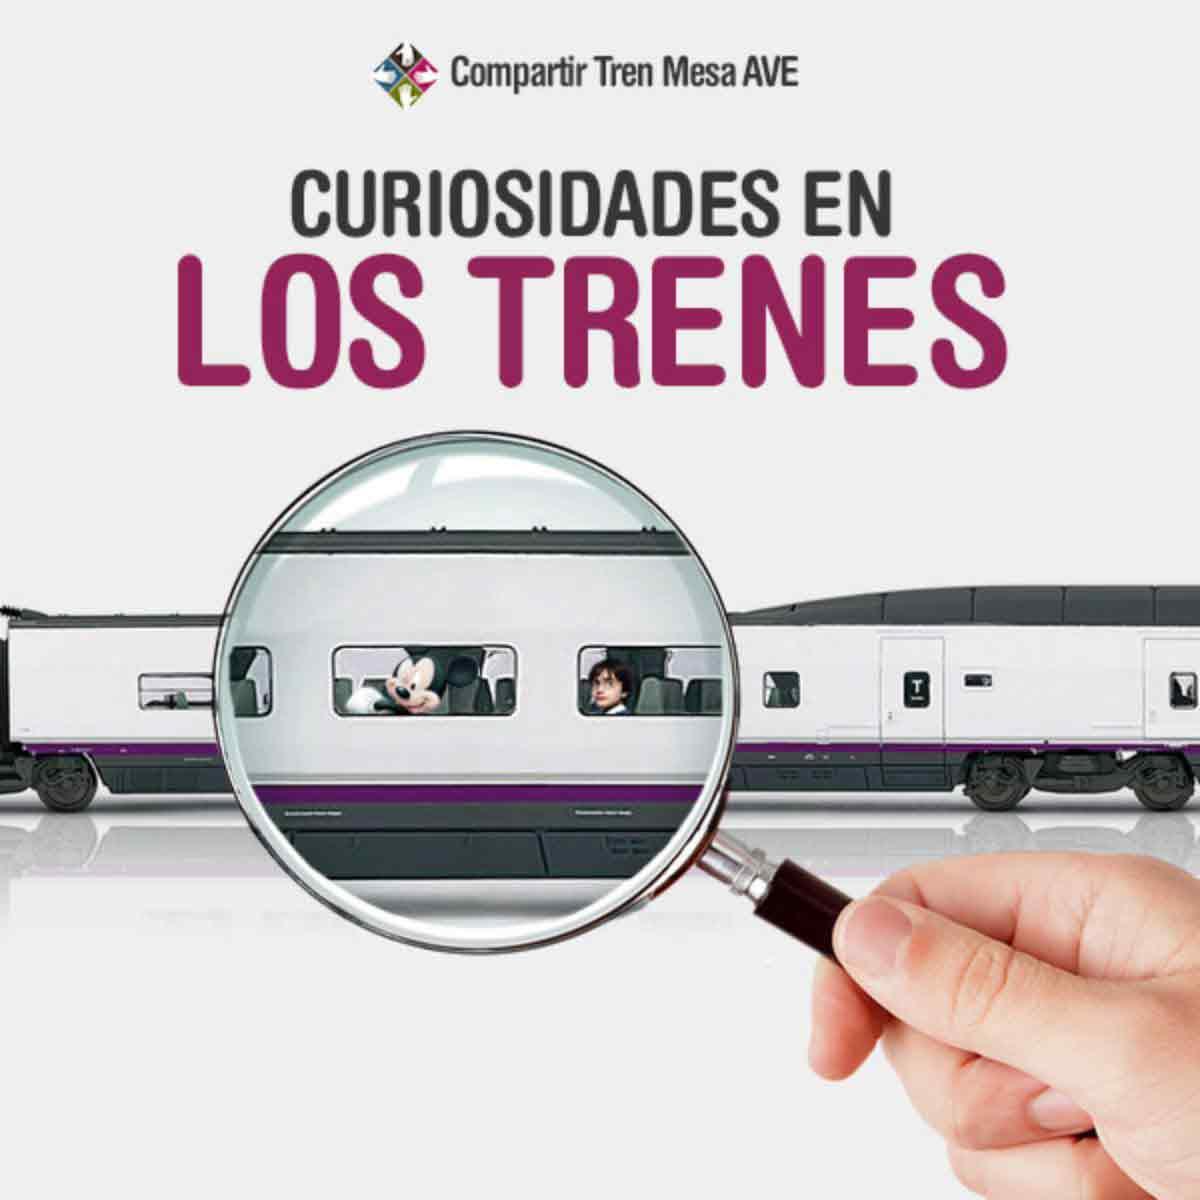 Curiosidades en los trenes for Tarifa mesa ave